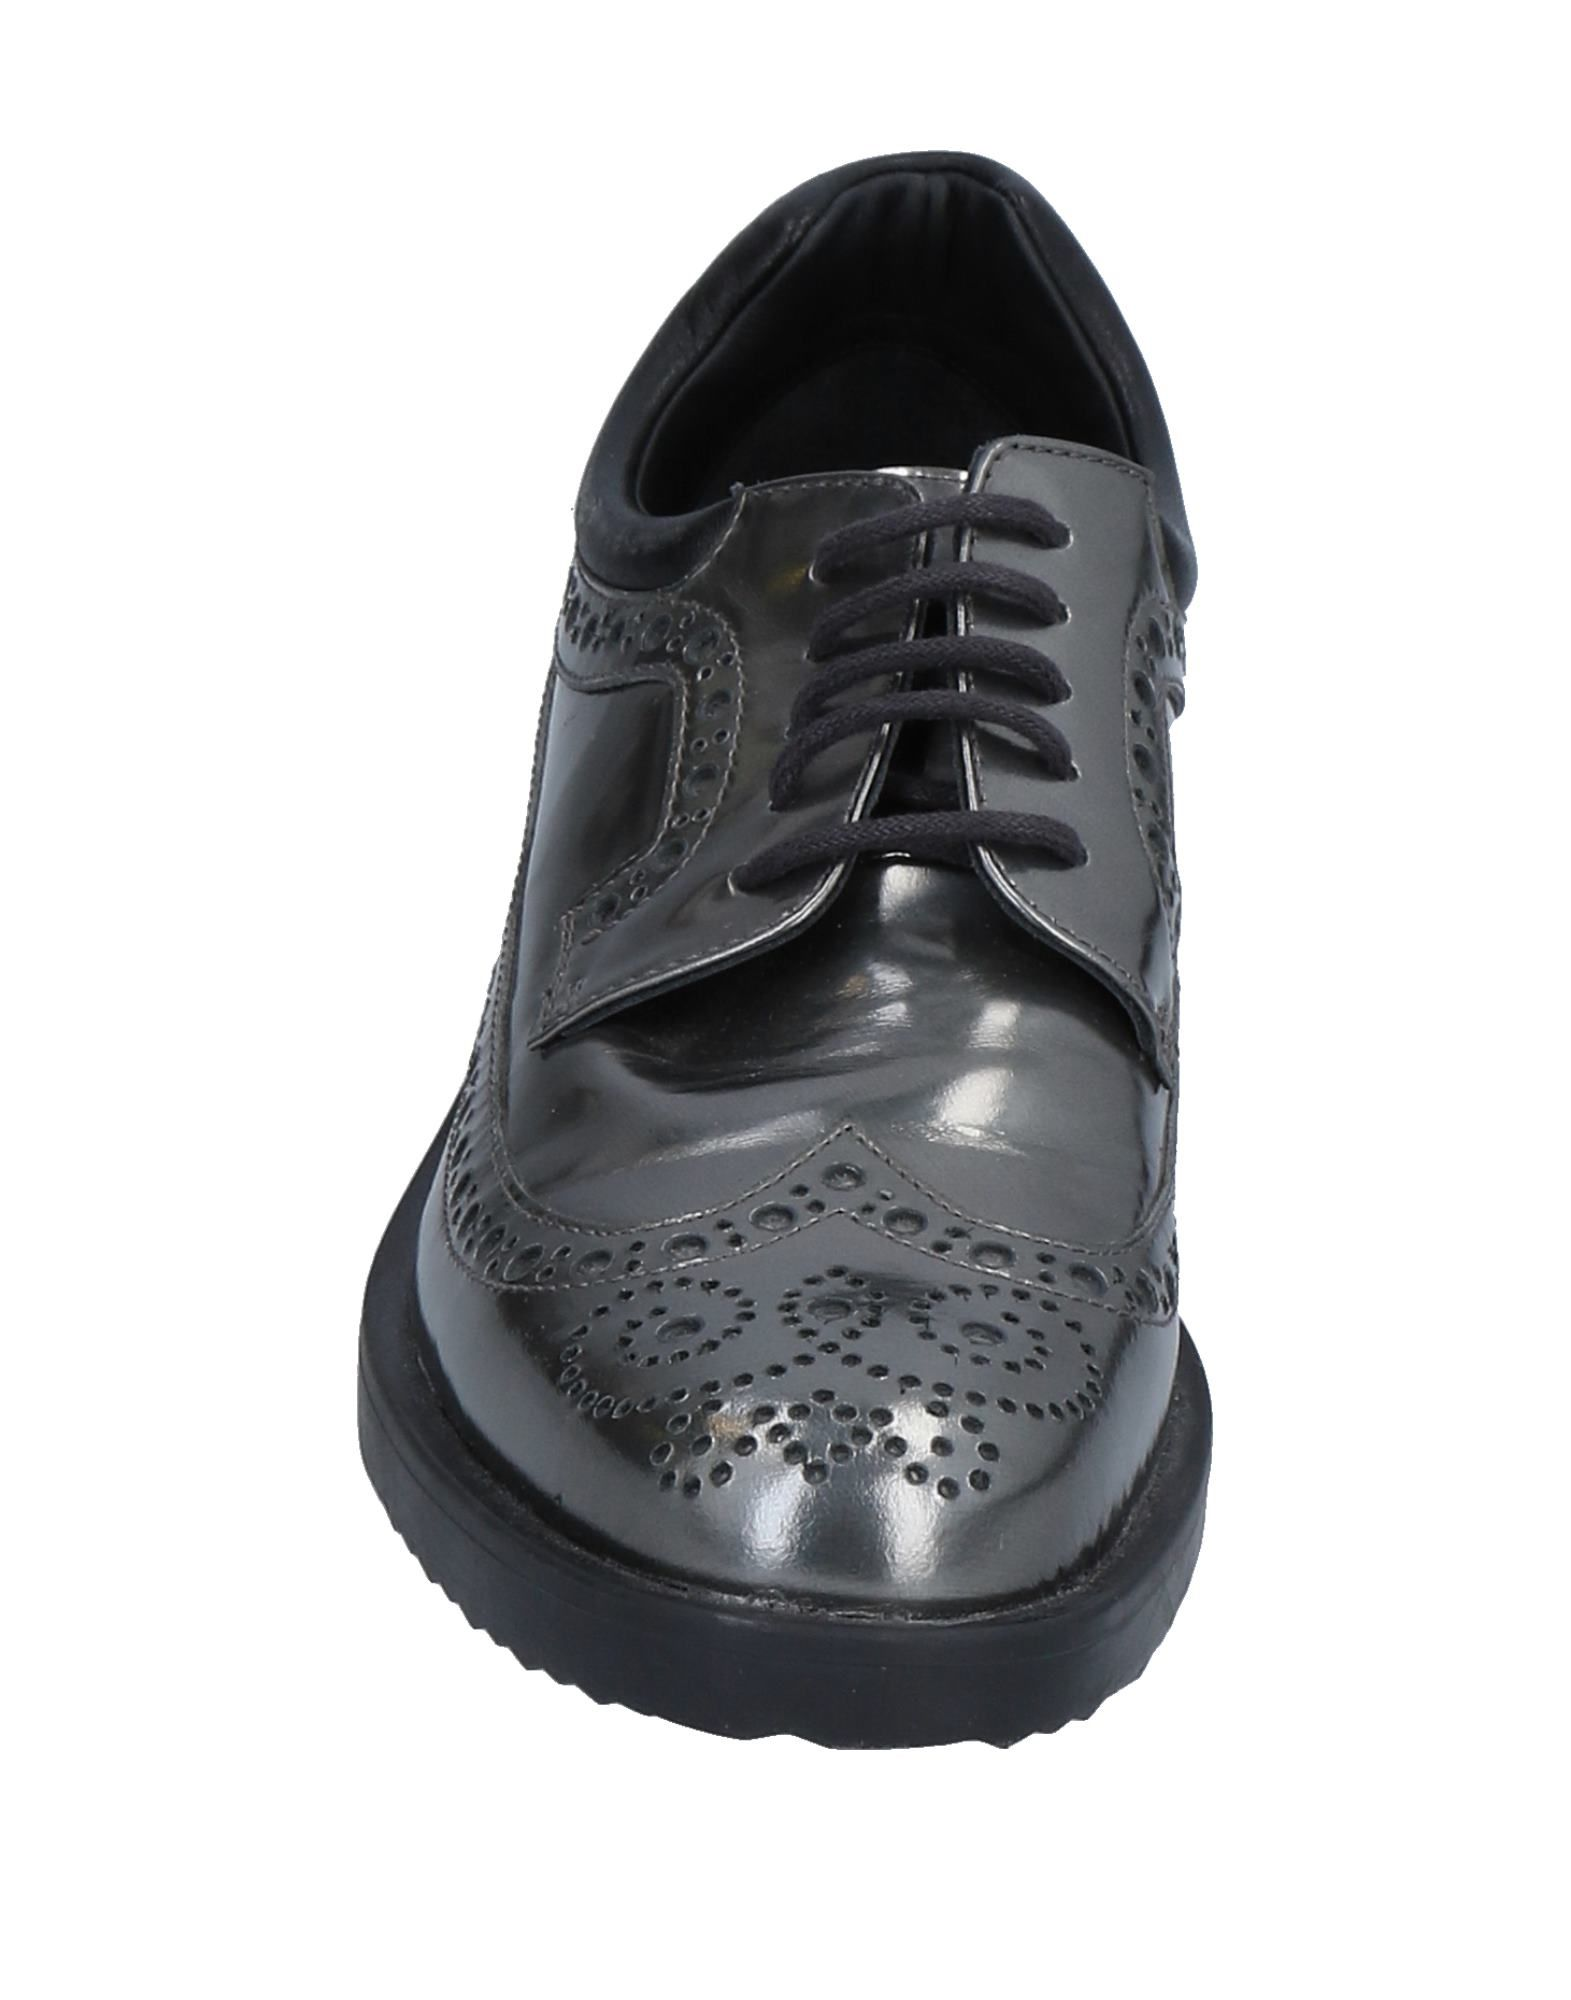 Gut um billige Schuhe Damen zu tragenVoile Blanche Schnürschuhe Damen Schuhe  11530551IH 73fcb6